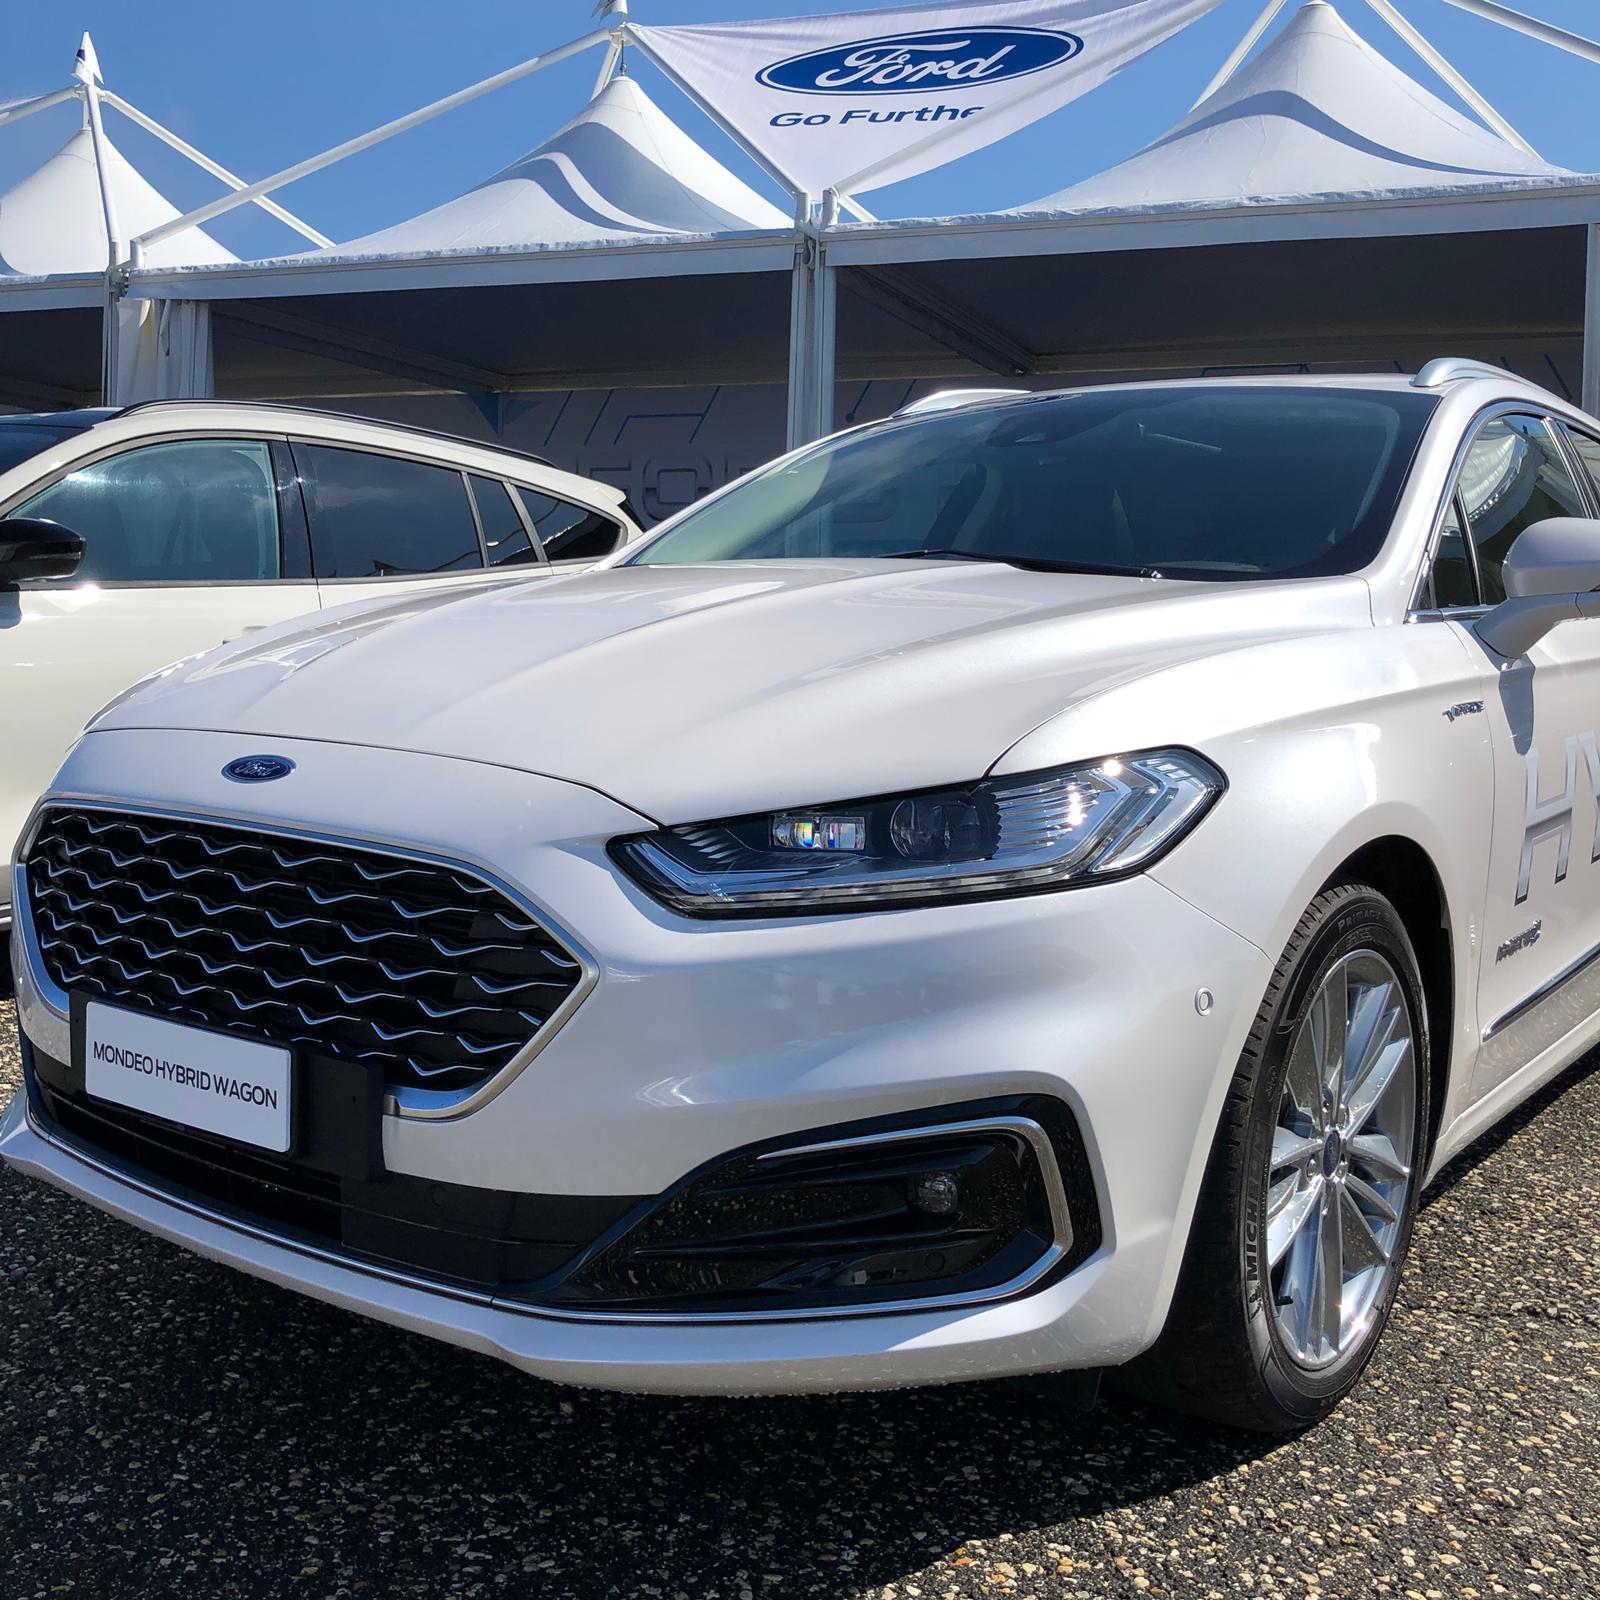 nuova-ford-mondeo-hybrid-wagon-anteprima-fleet-motor-day-2019